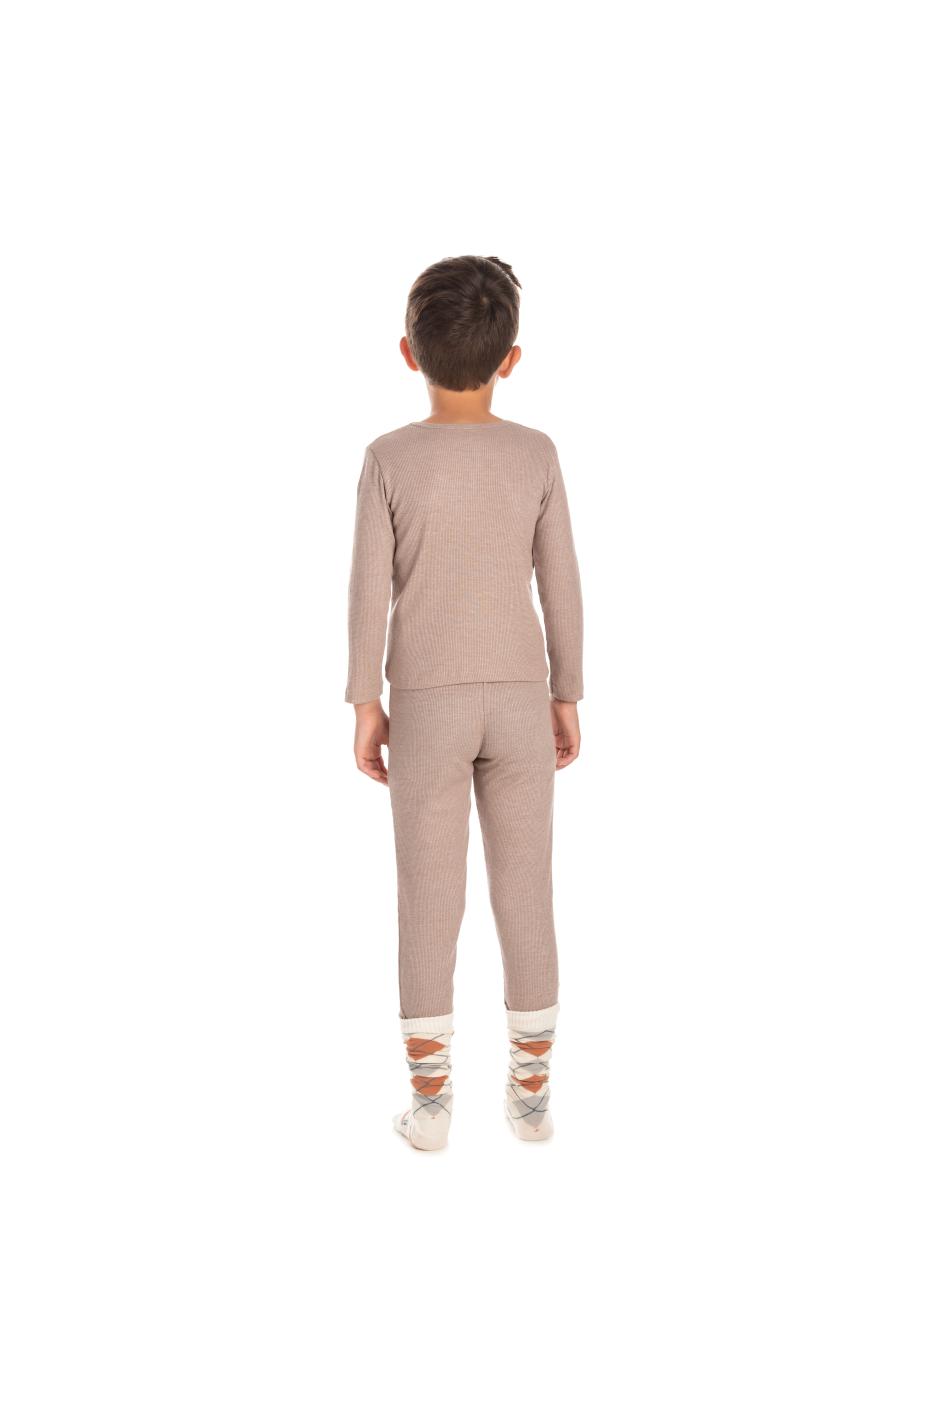 100/A - Calça Infantil Unissex Underwear